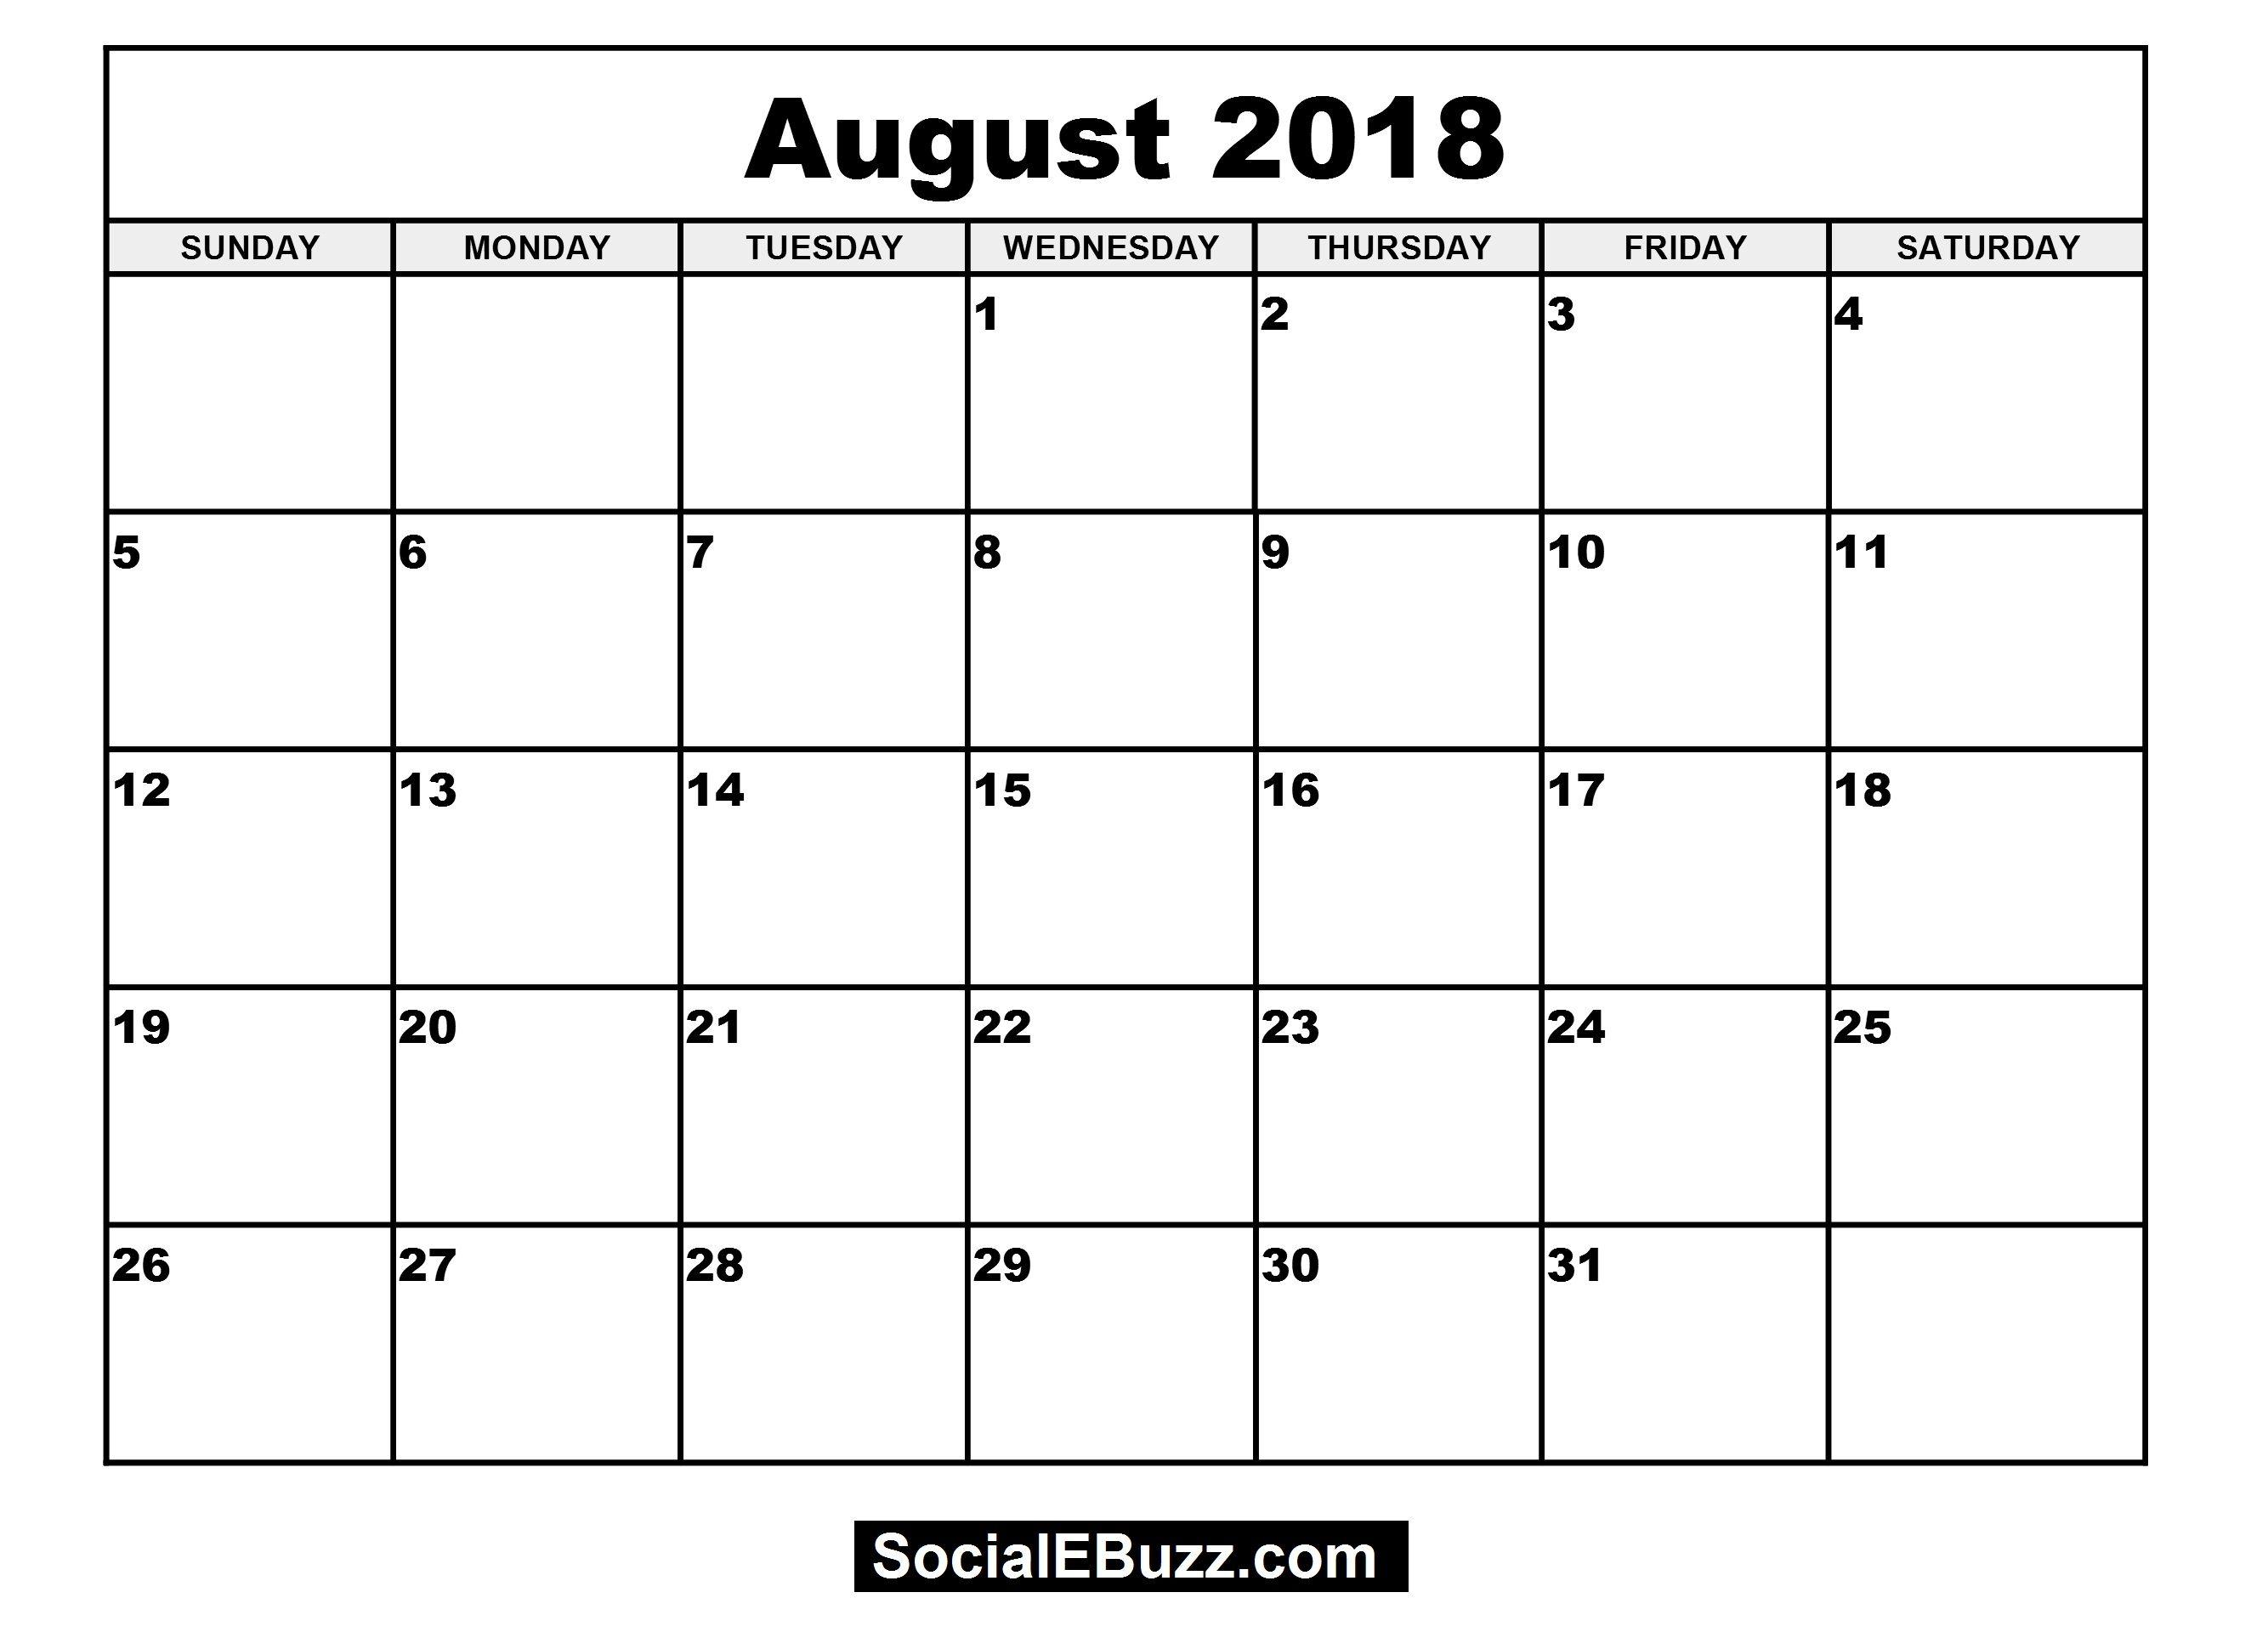 Pincalendar Printable On August 2018 Calendar | 2018 Calendar with Calendar Template For August